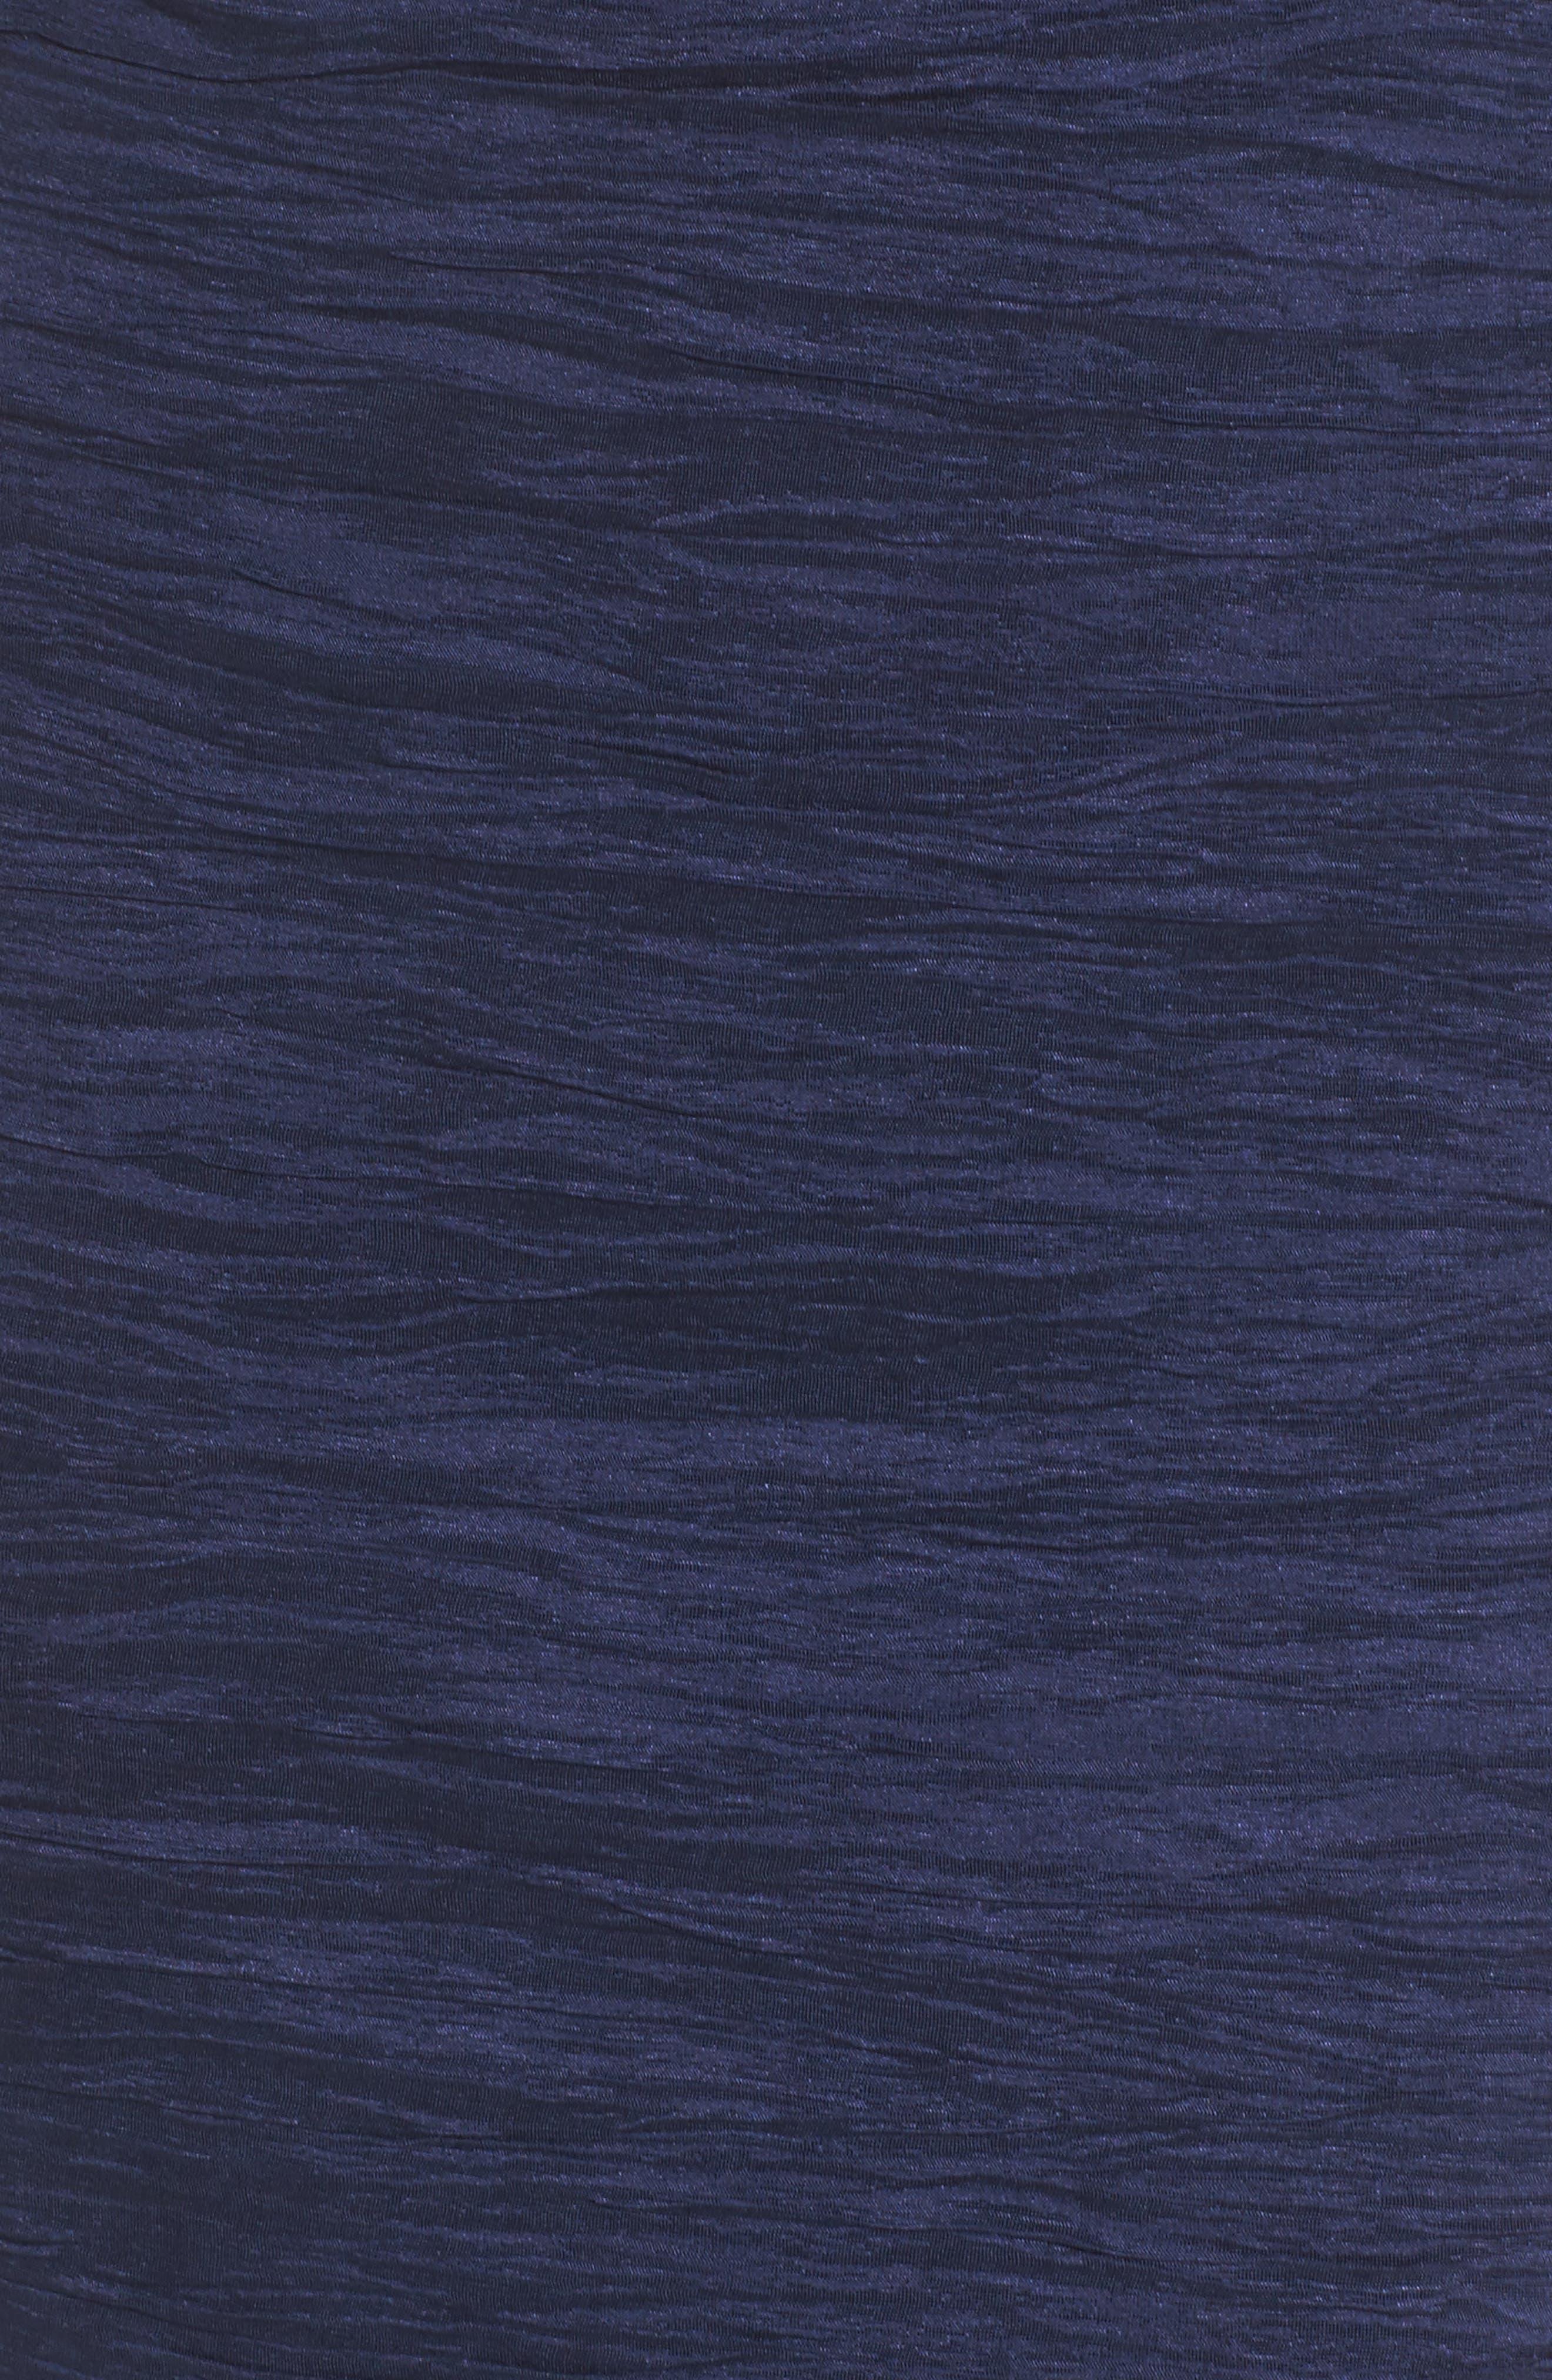 Embellished Cutout Taffeta Sheath Dress,                             Alternate thumbnail 6, color,                             410